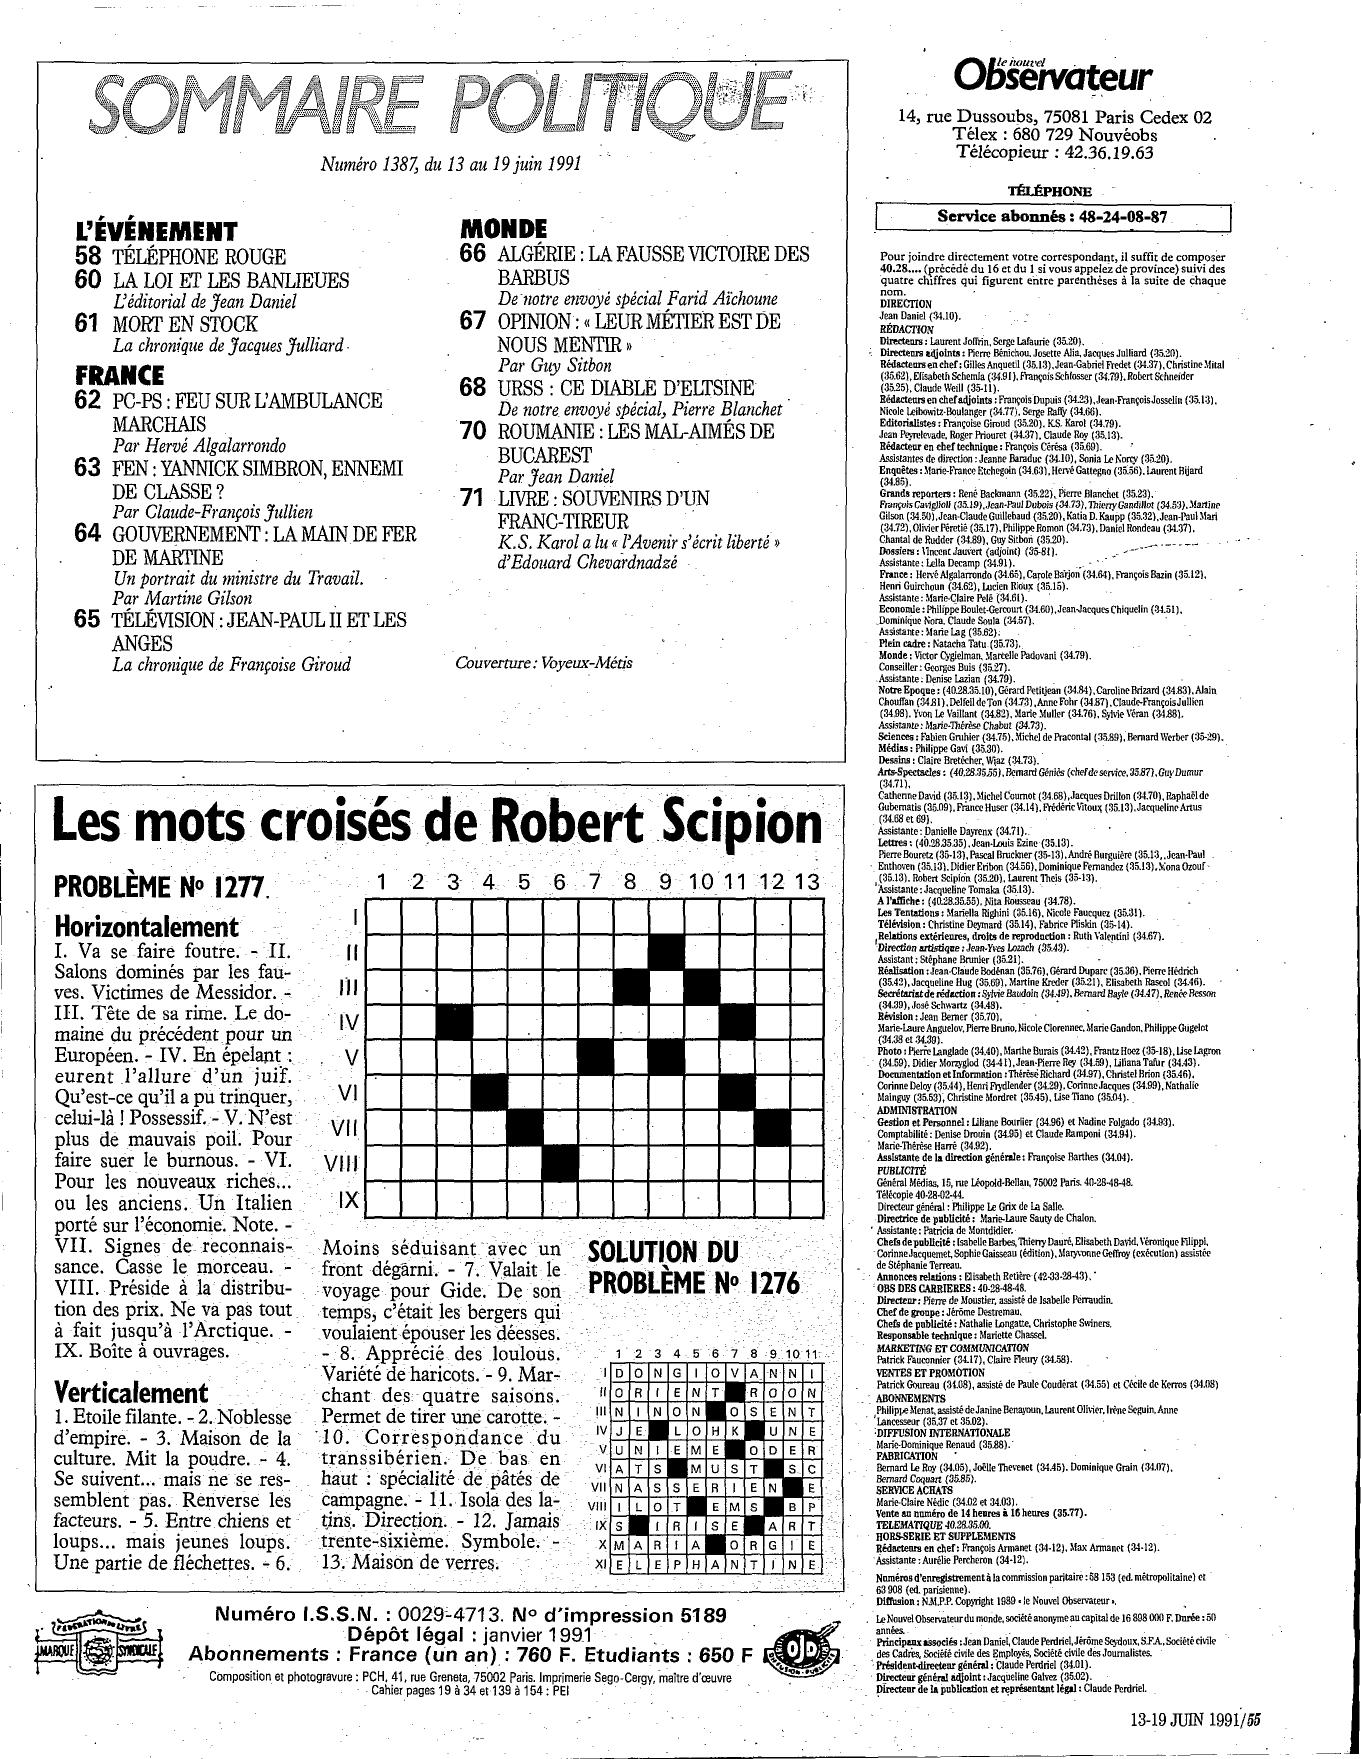 Les Mots Croisés De Robert Scipion